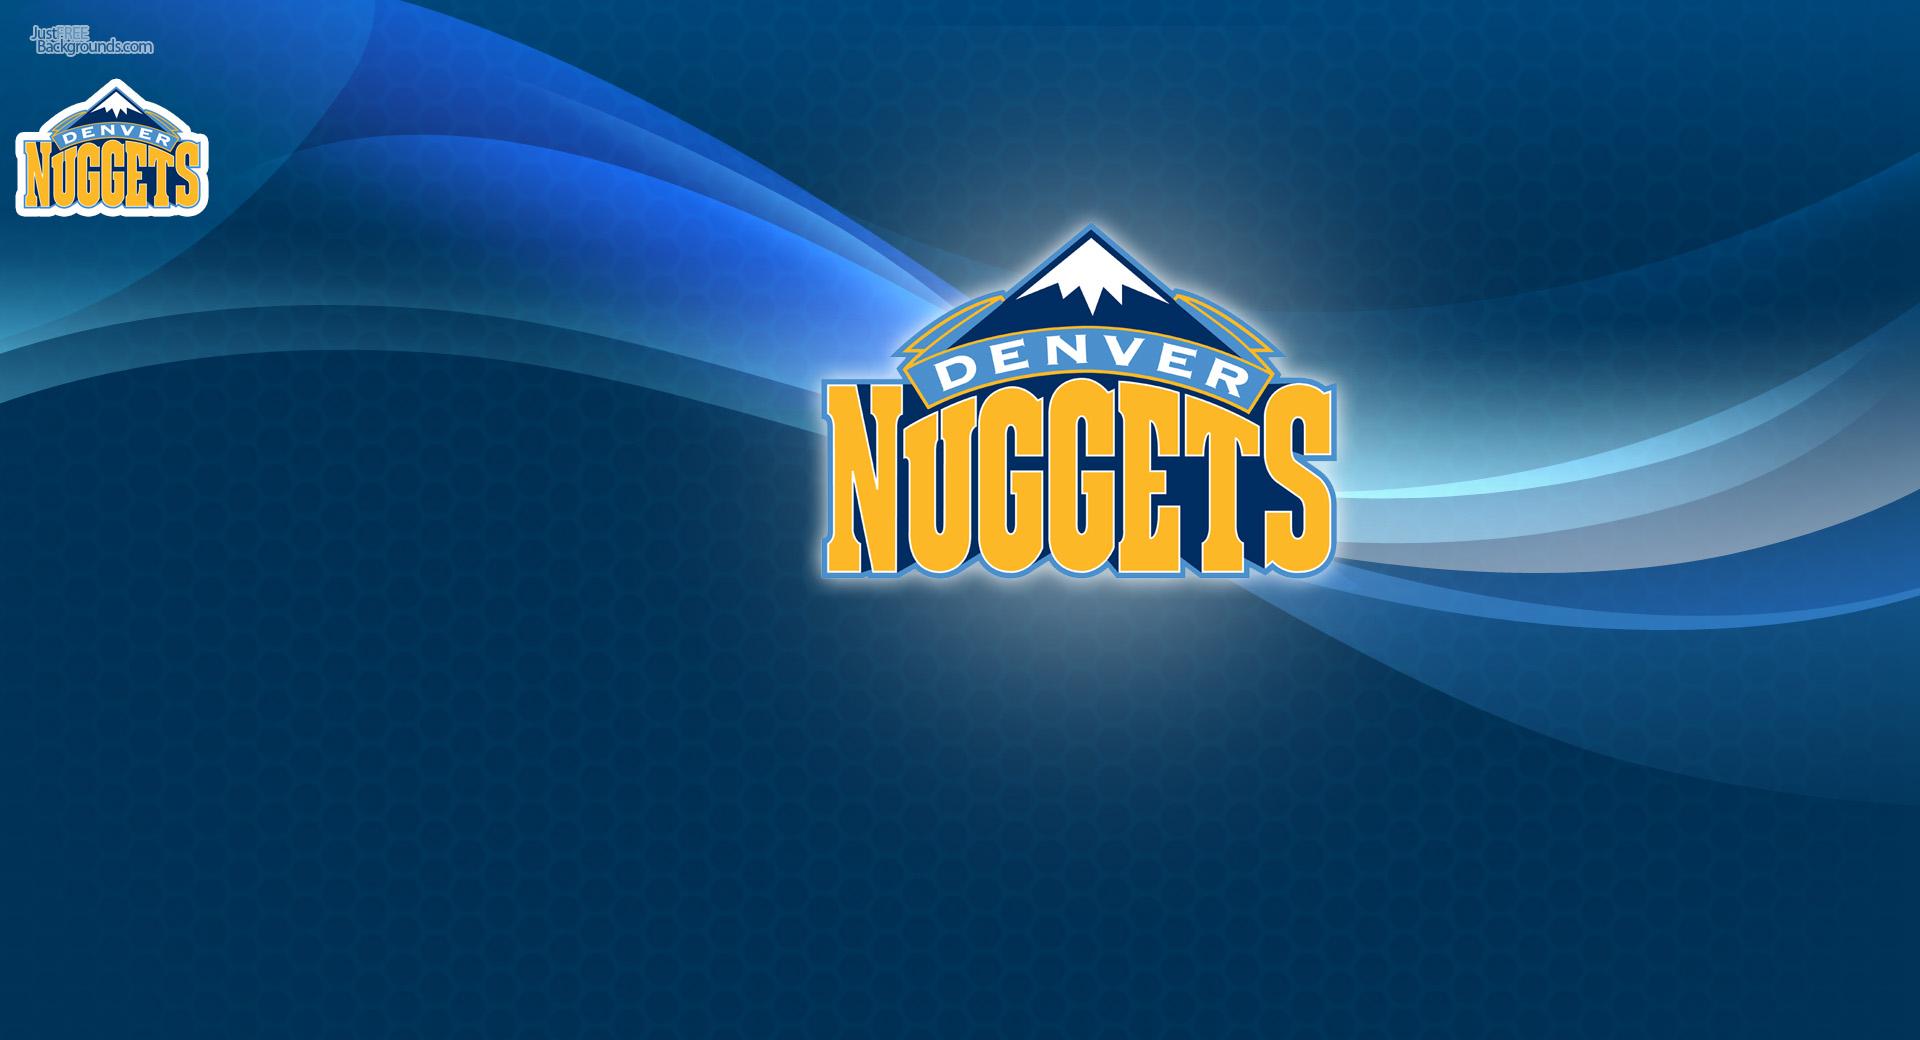 Denver Nuggets  Full HD Widescreen wallpapers for desktop